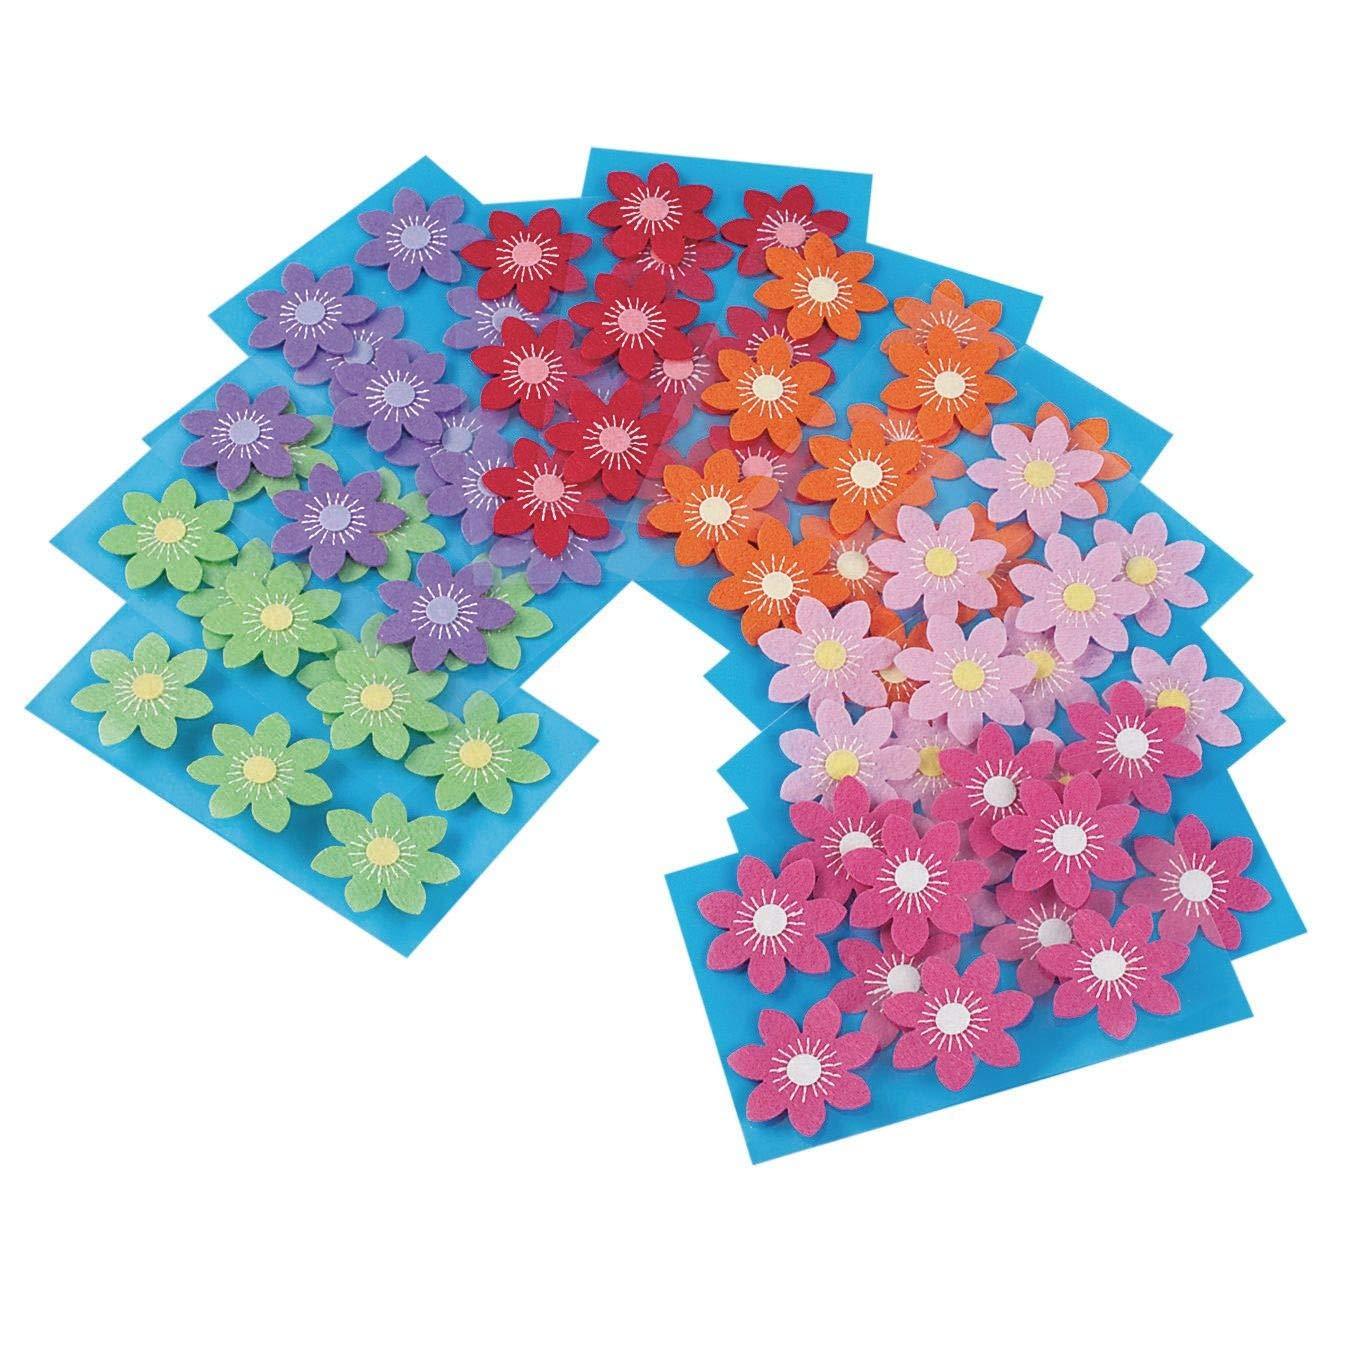 Felt Flower Stickers (Pack of 72)